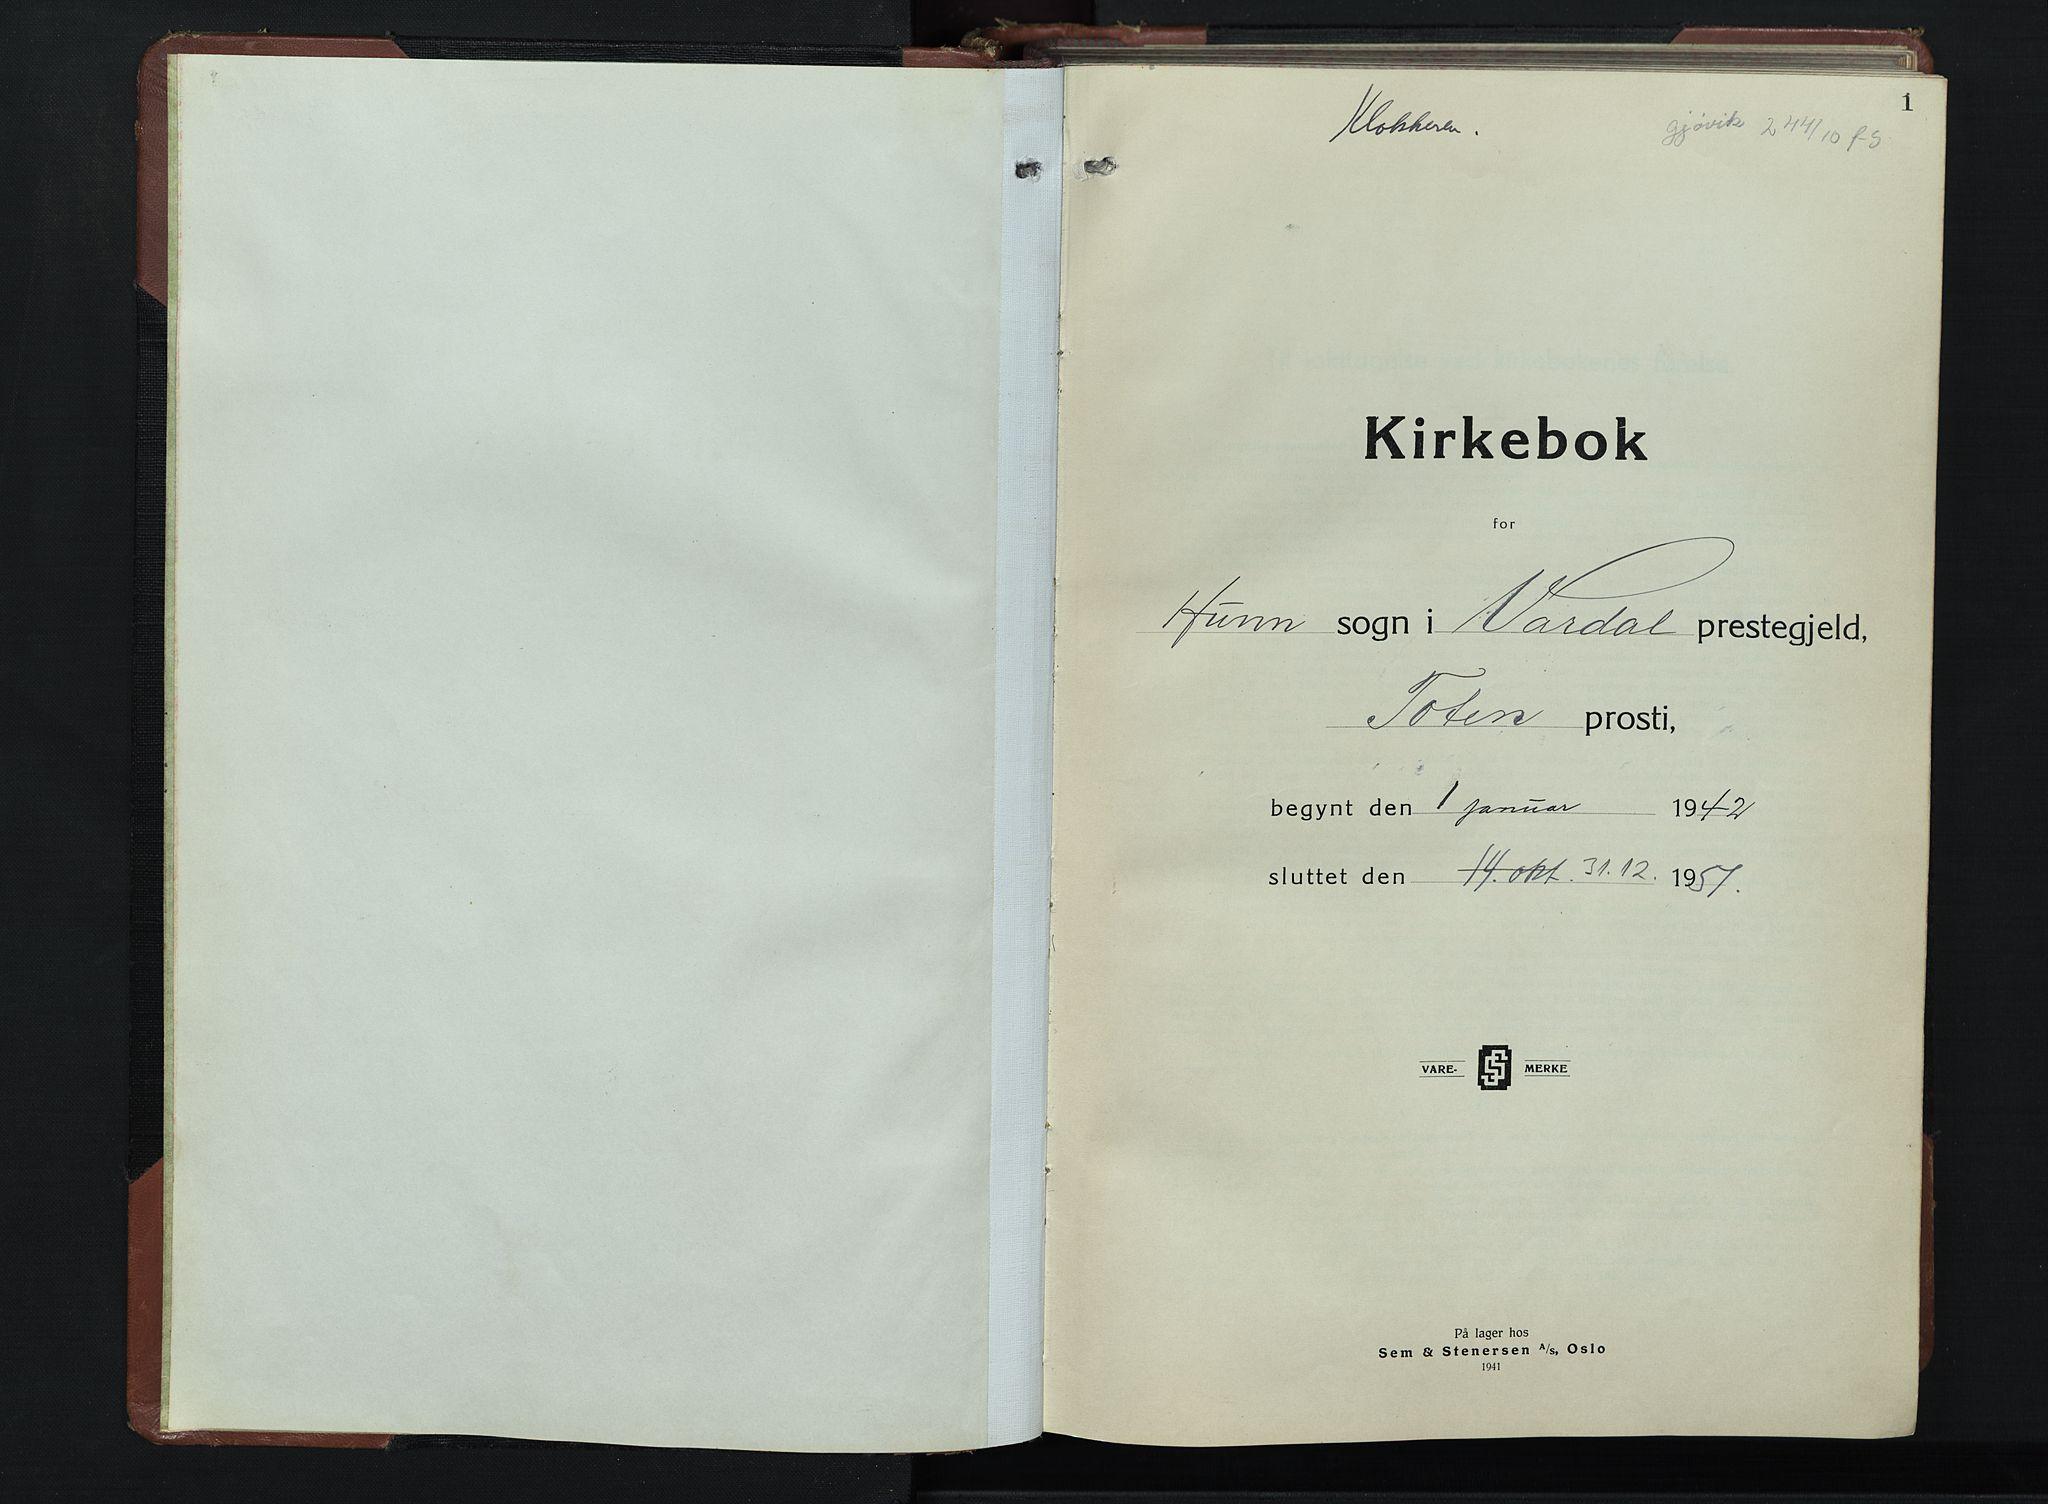 SAH, Vardal prestekontor, H/Ha/Hab/L0019: Klokkerbok nr. 19, 1941-1951, s. 1